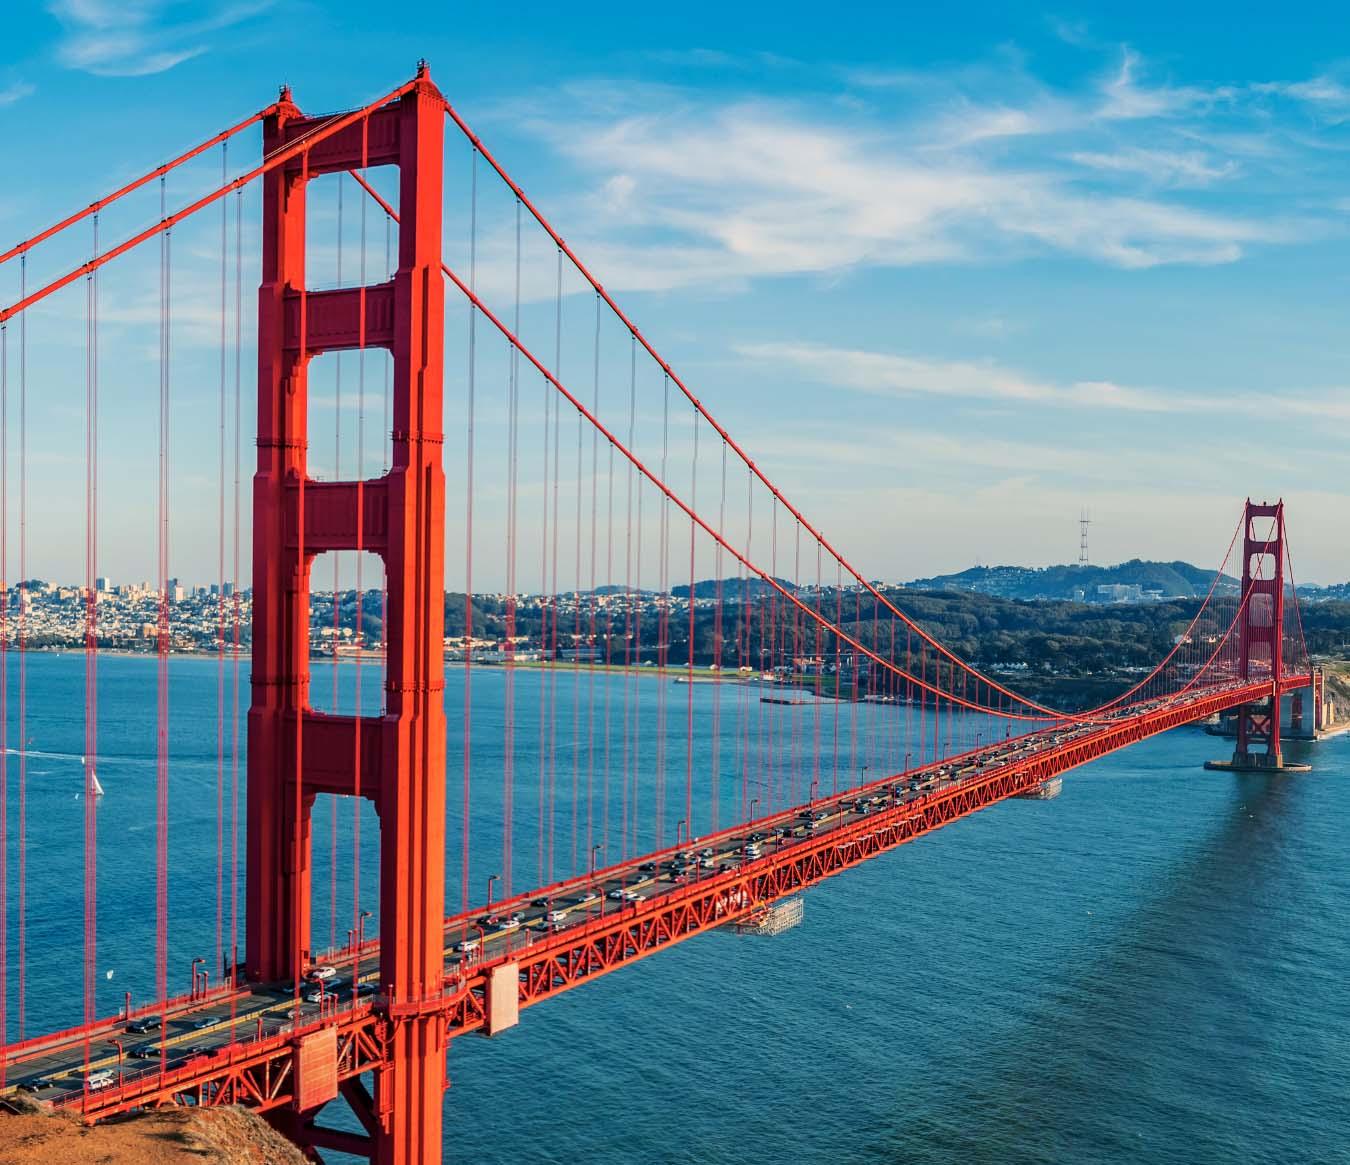 Things to Do in San Francisco - Golden Gate Bridge